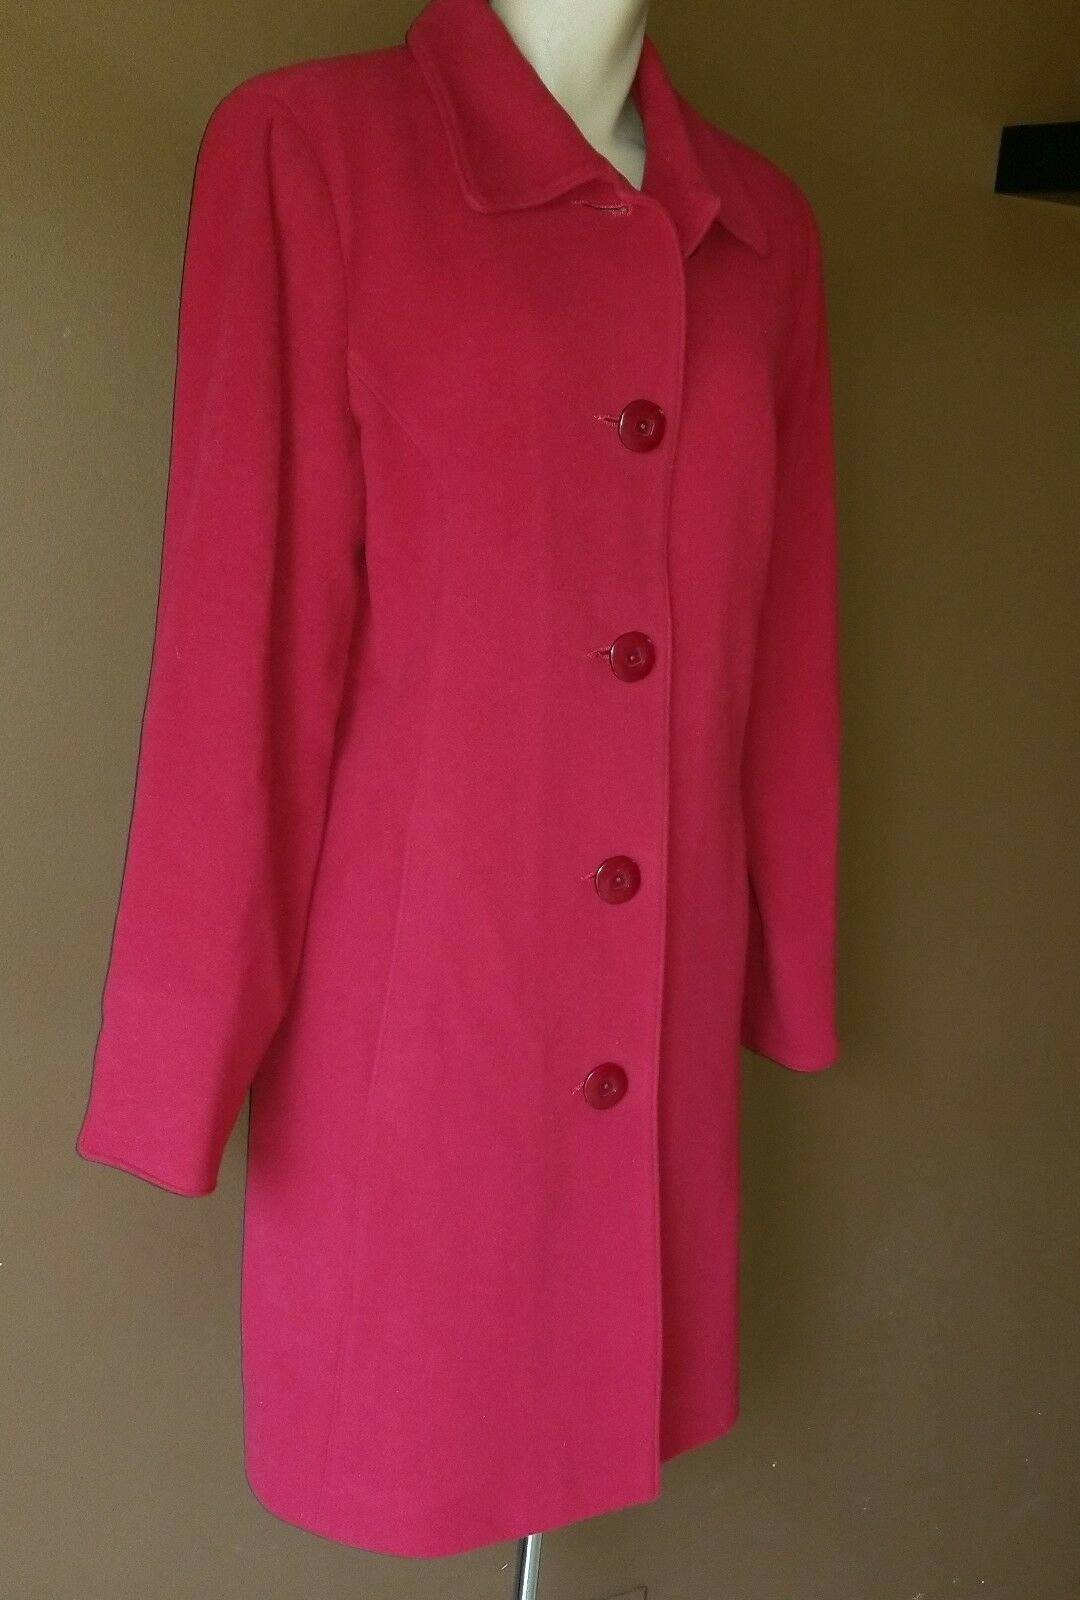 Kristen Kristen Kristen Blake wool blend red coat, Sz 12 767953